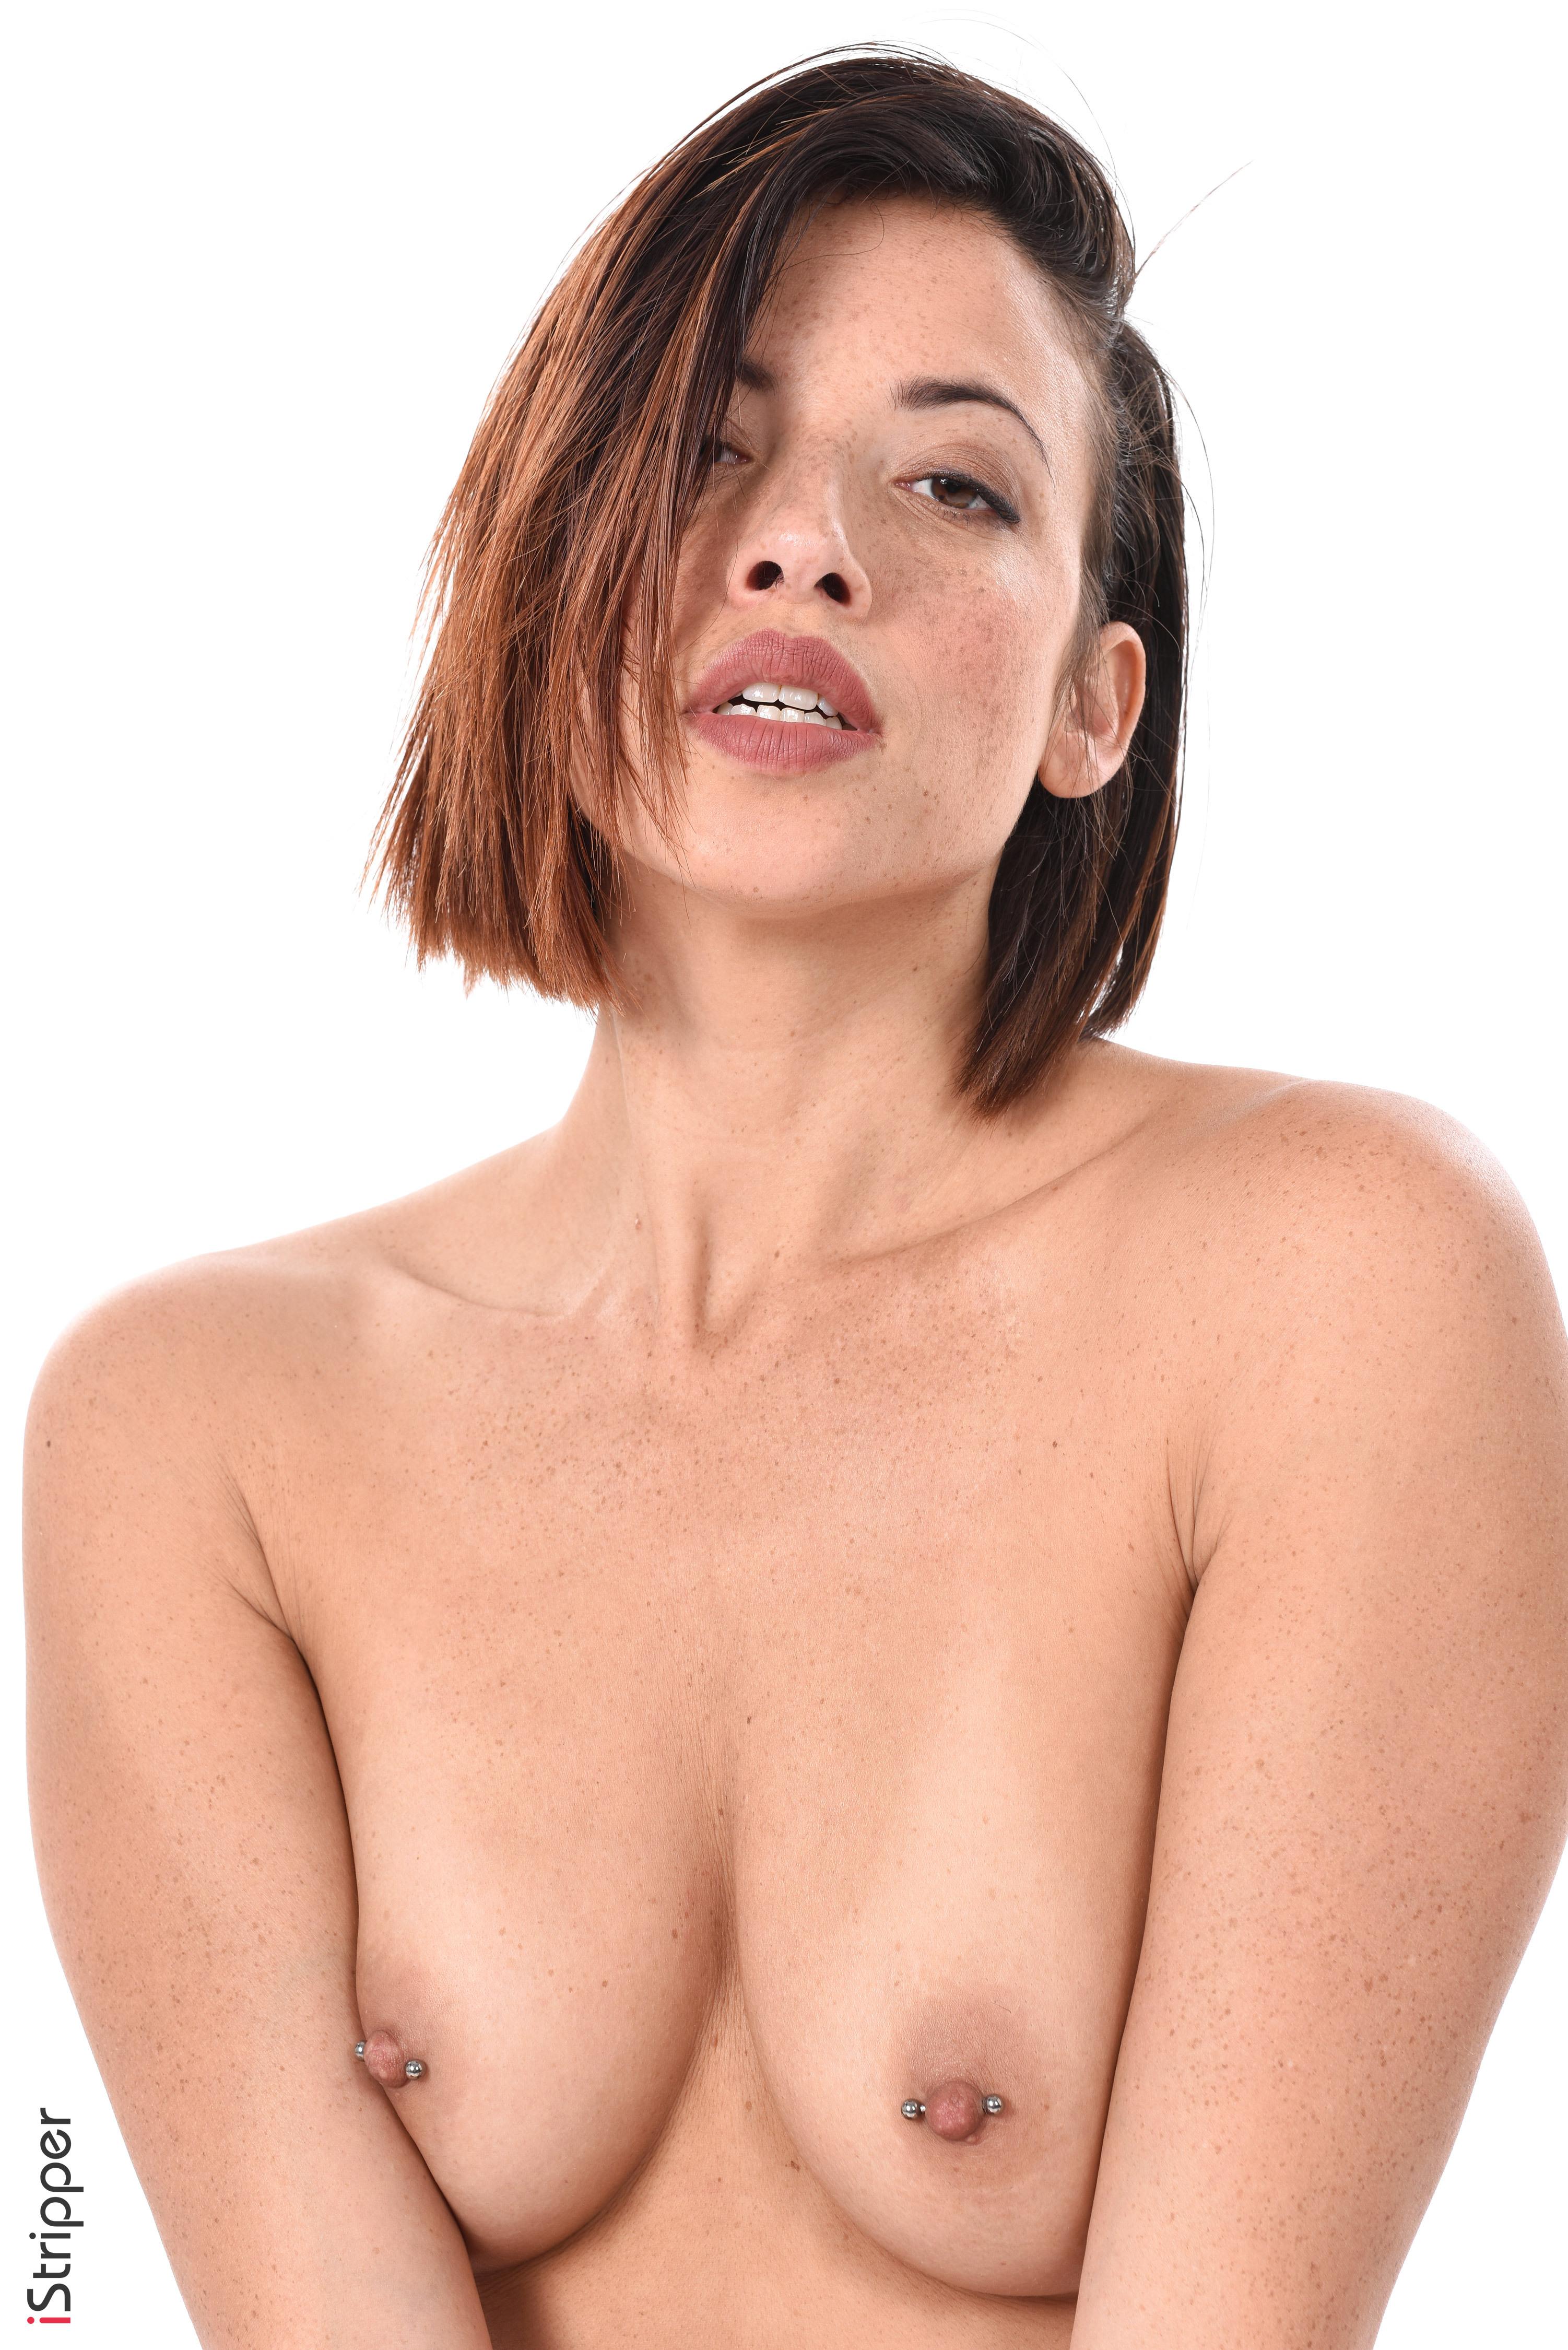 hd wallpapers hd nude sarah nicola